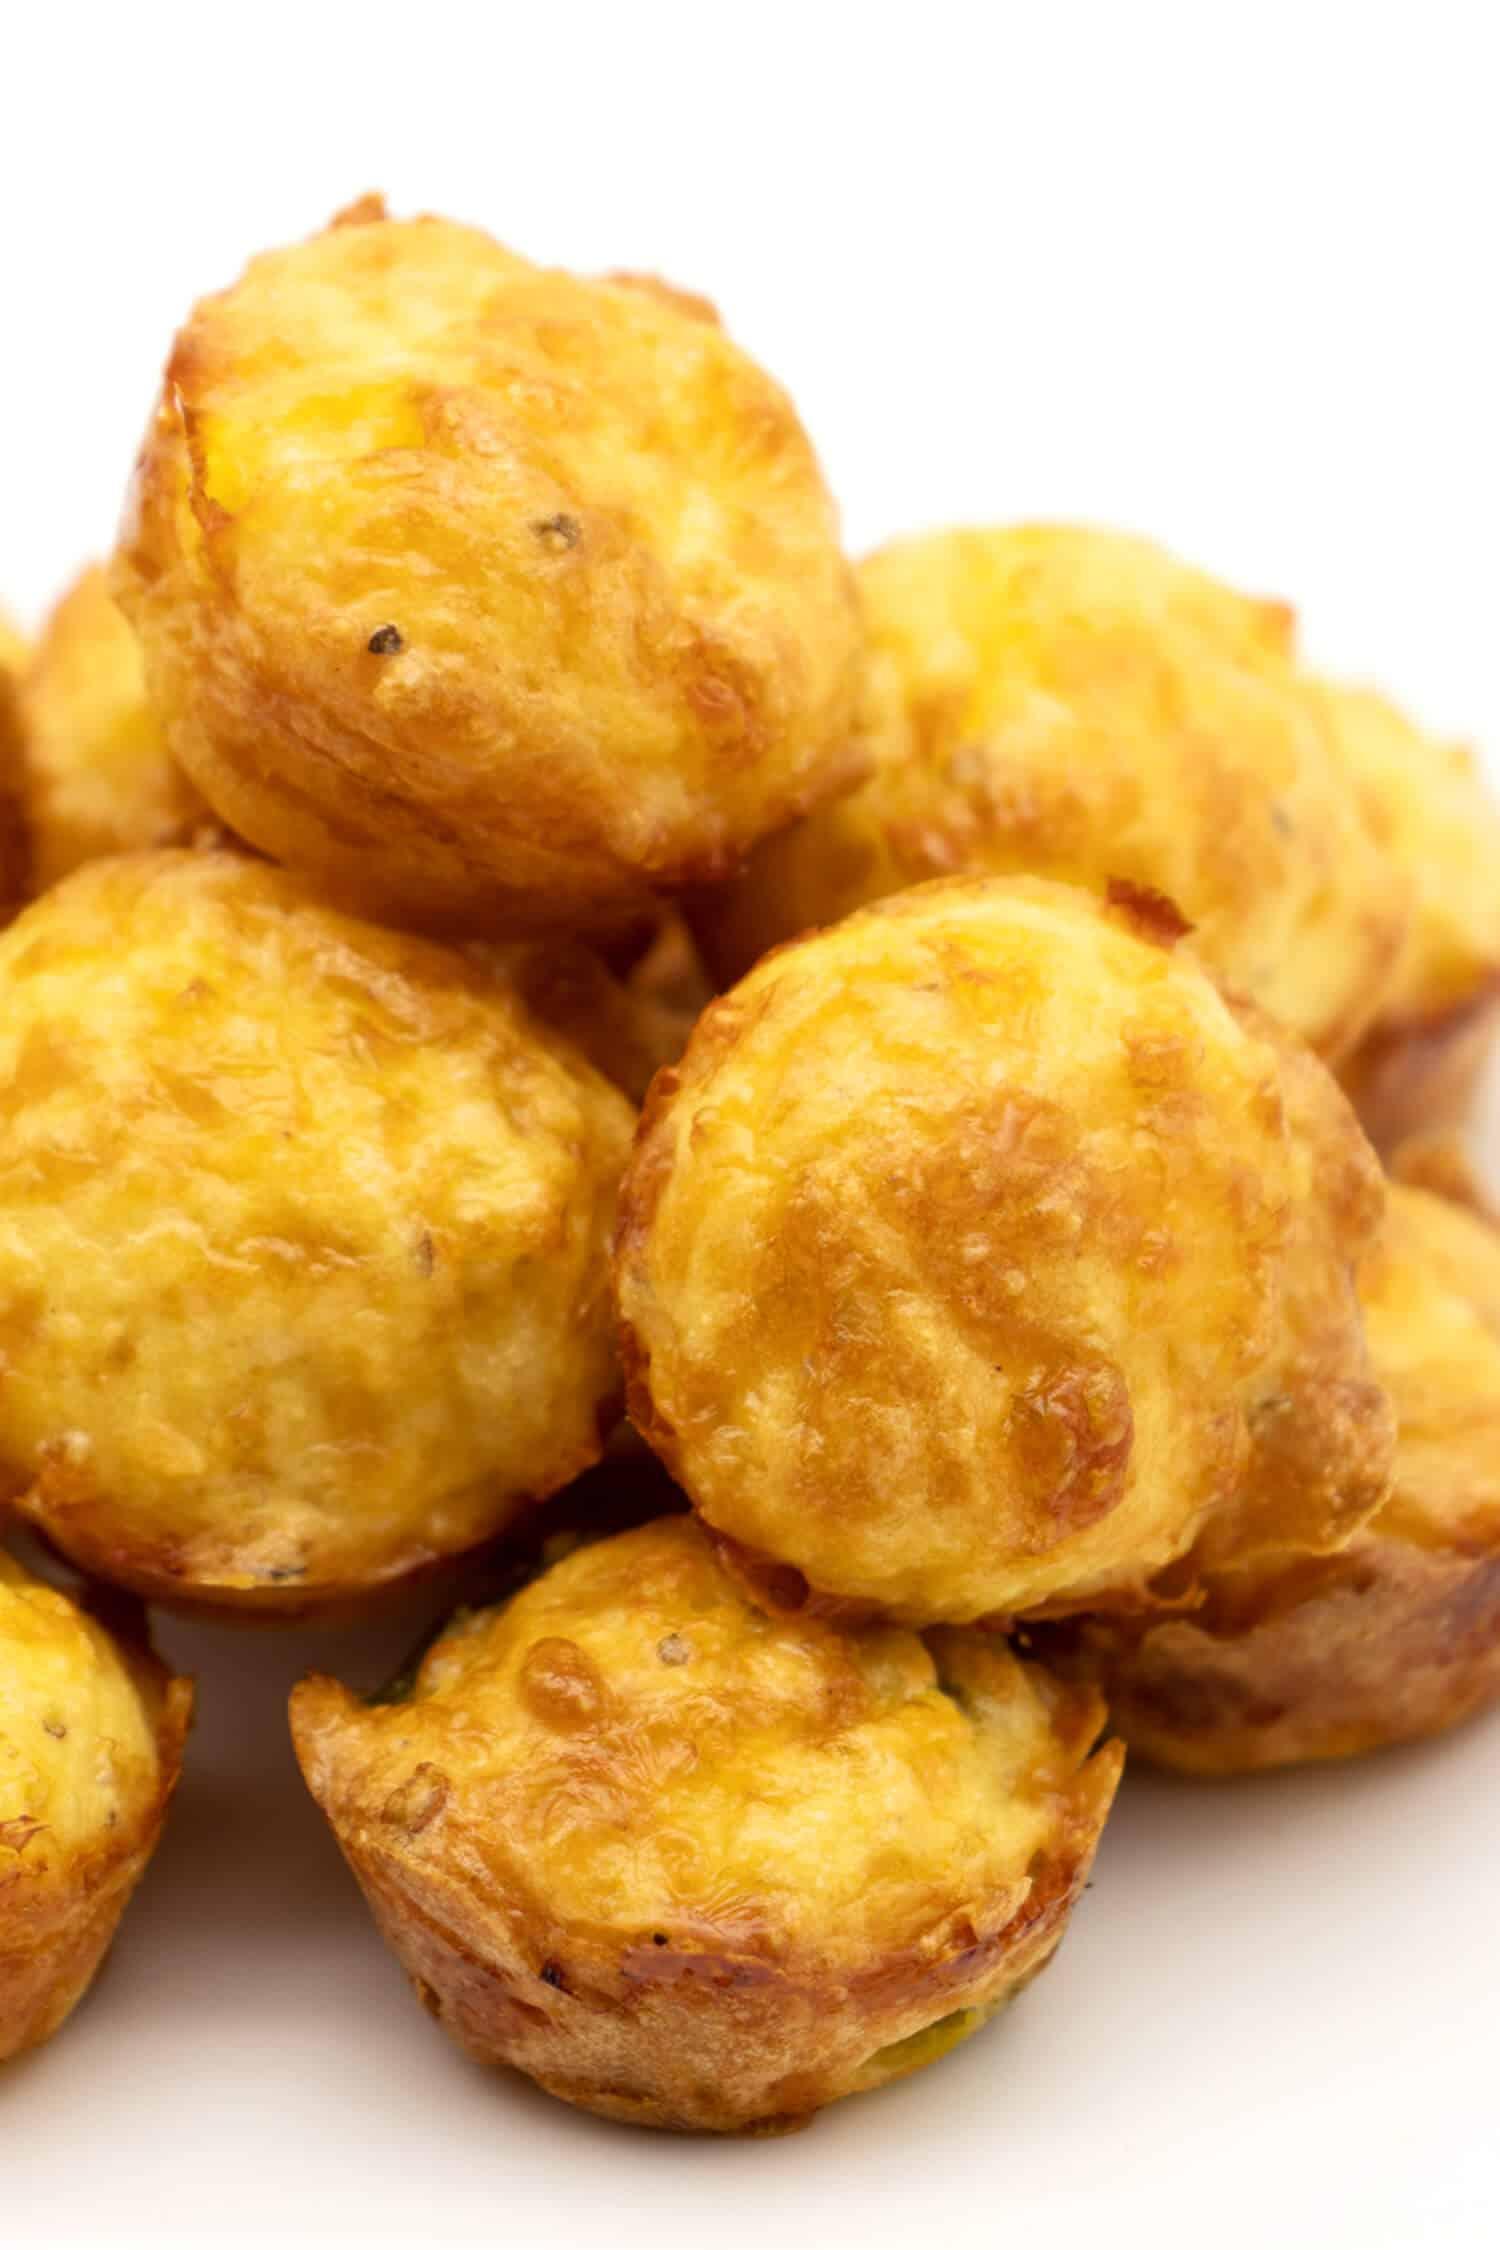 Schnelle Low Carb Snacks Rezepte: Käsebällchen